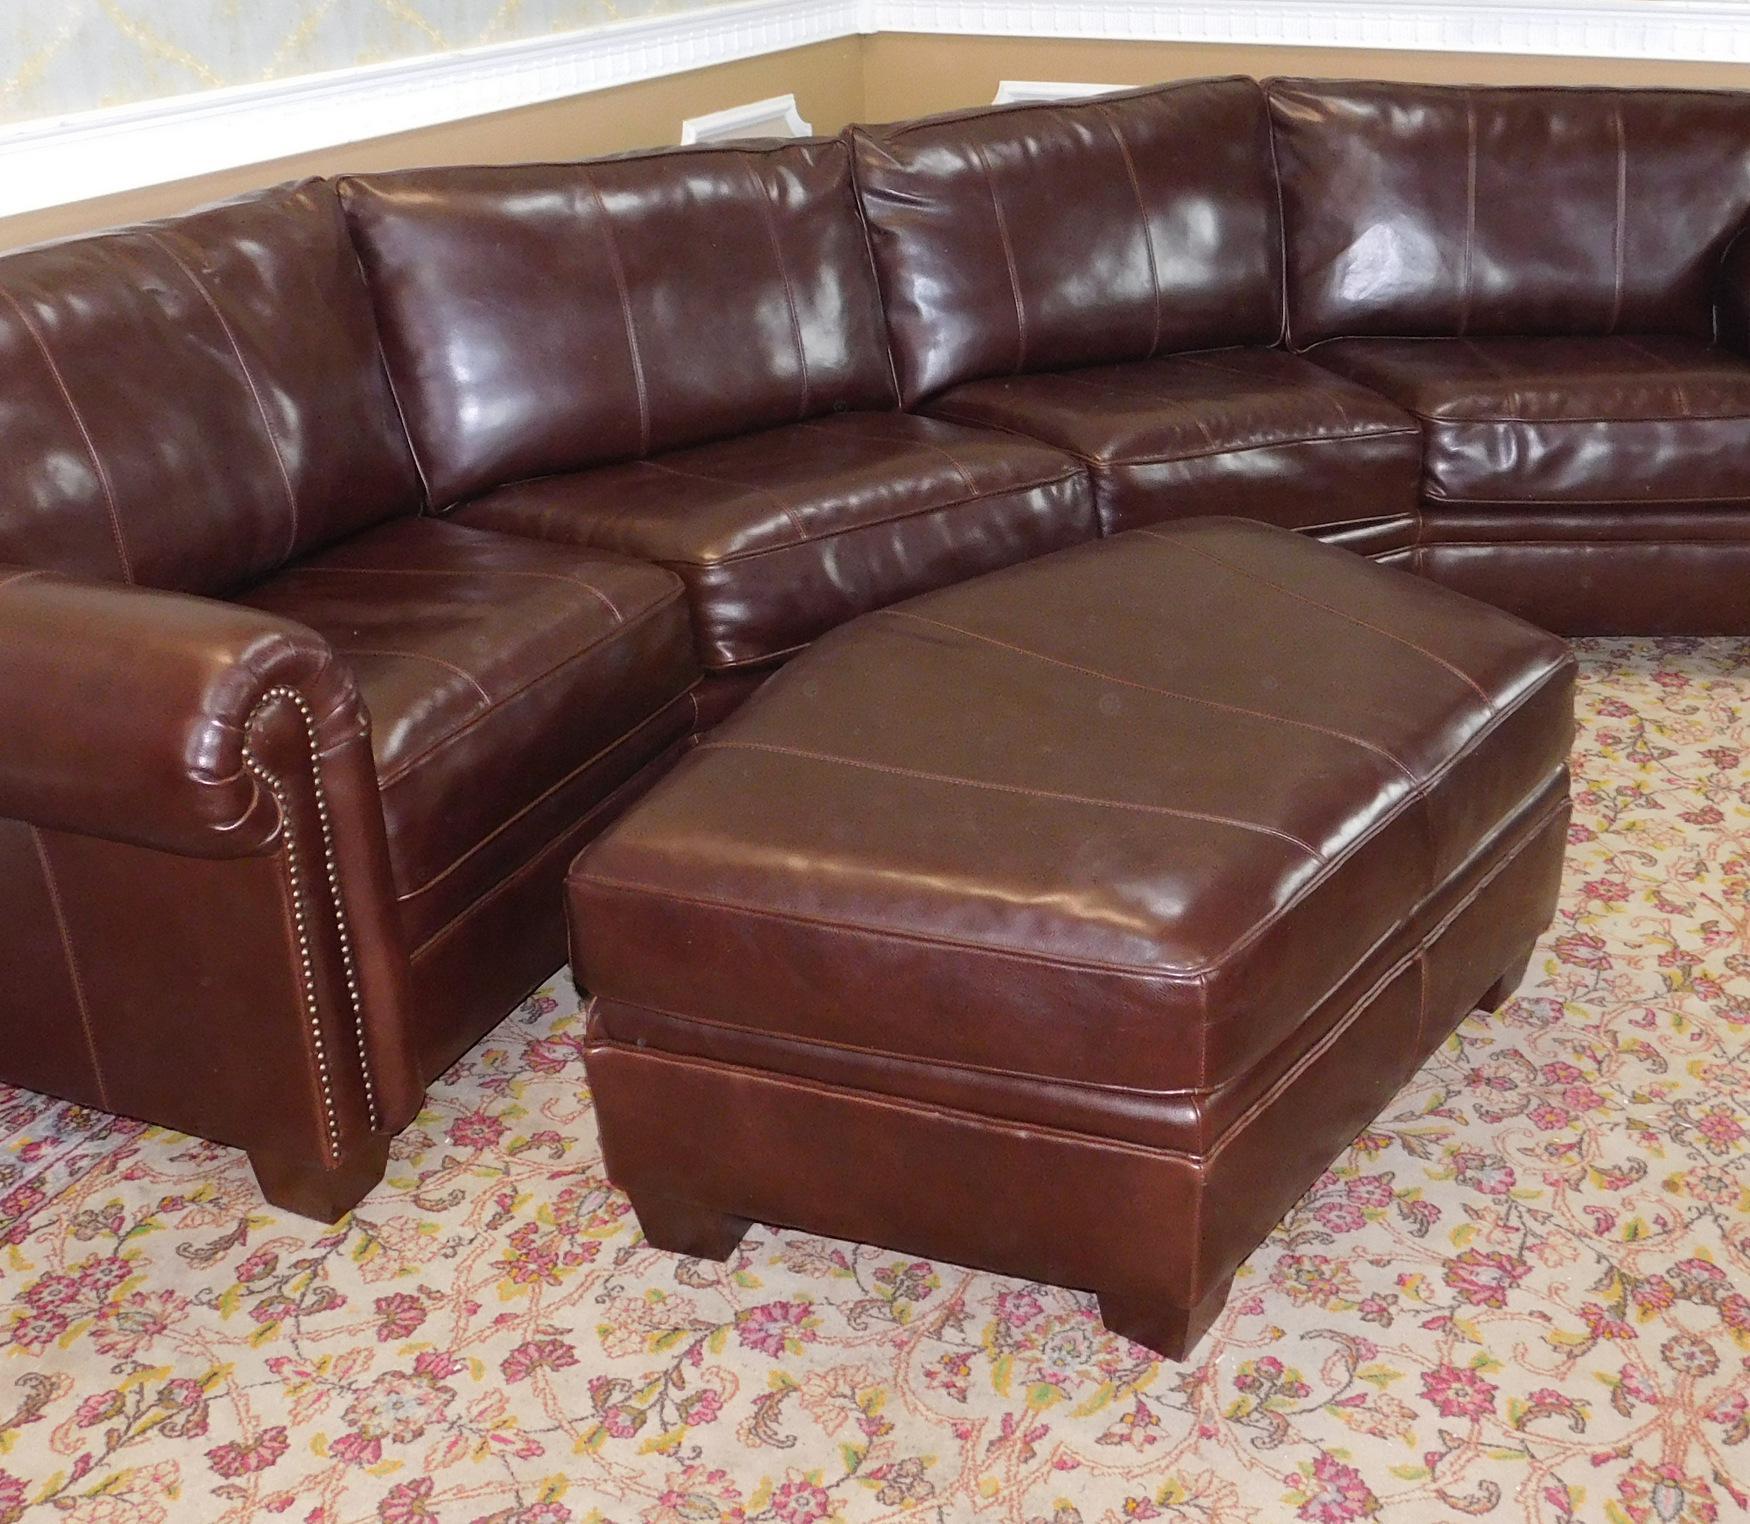 bernhardt brown leather club chair ball game 3-piece sectional sofa & ottoman | chairish